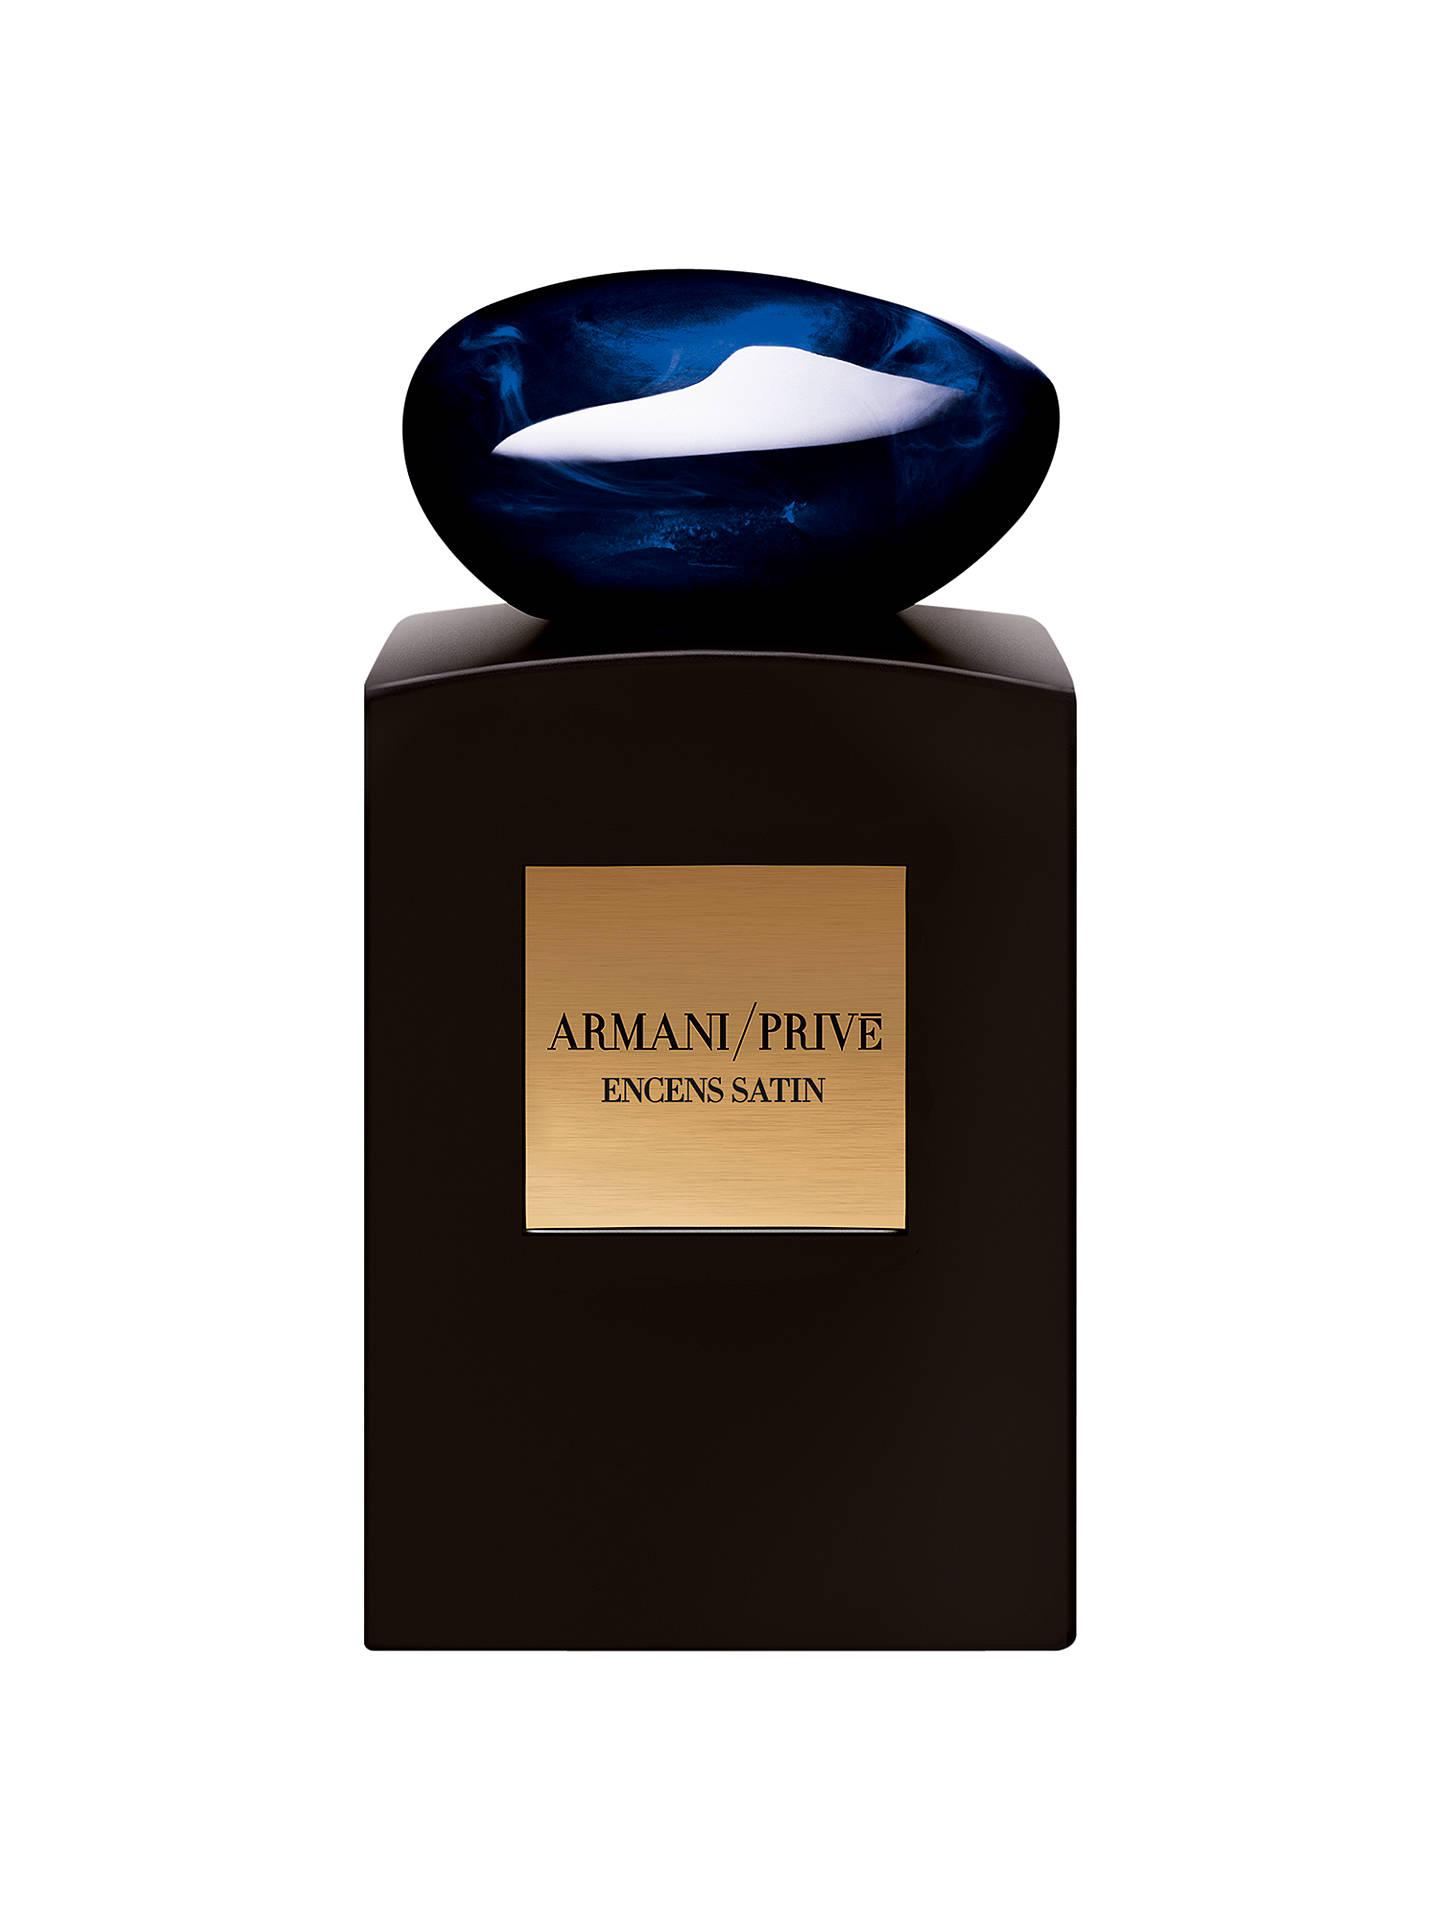 d4bbb4ba7a9 BuyGiorgio Armani   Privé Encens Satin Eau de Parfum